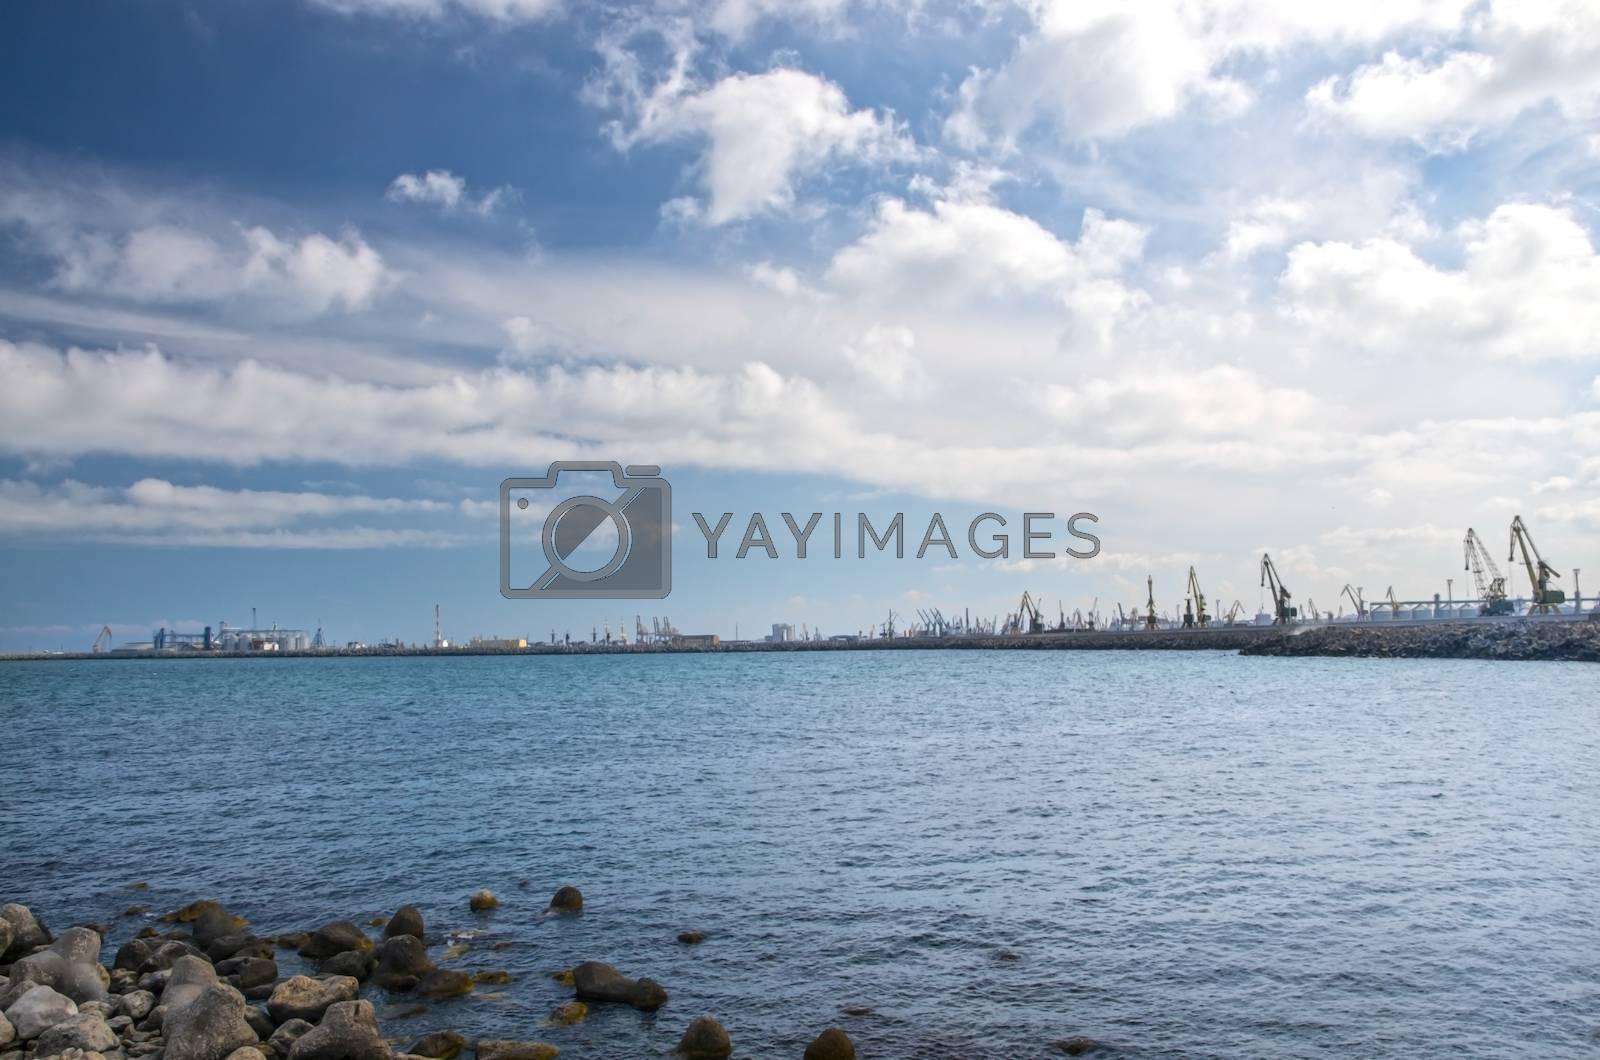 Shipyard In Constanta with big cranes at the horrizon.